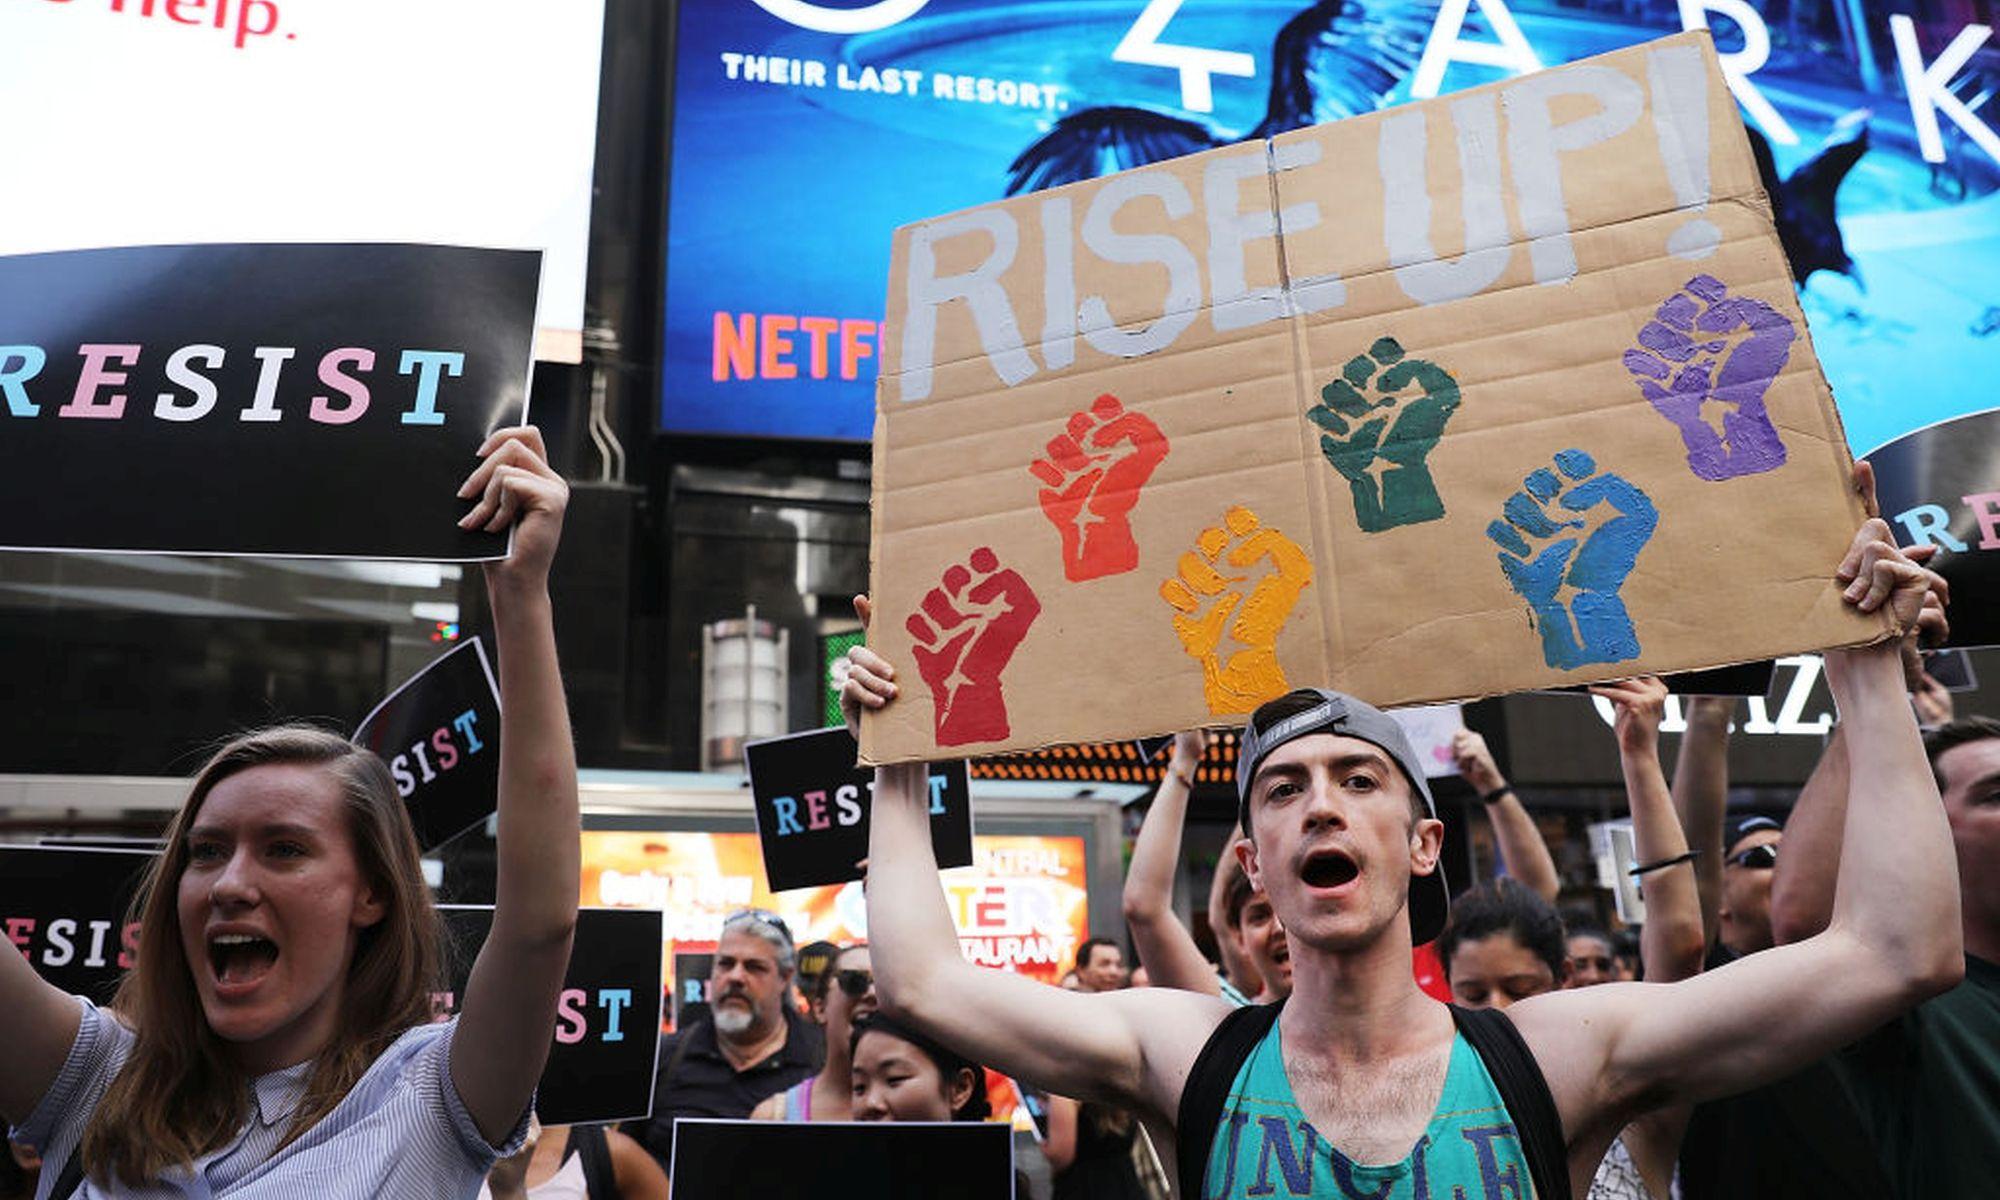 Identity politics is a menace to democracy